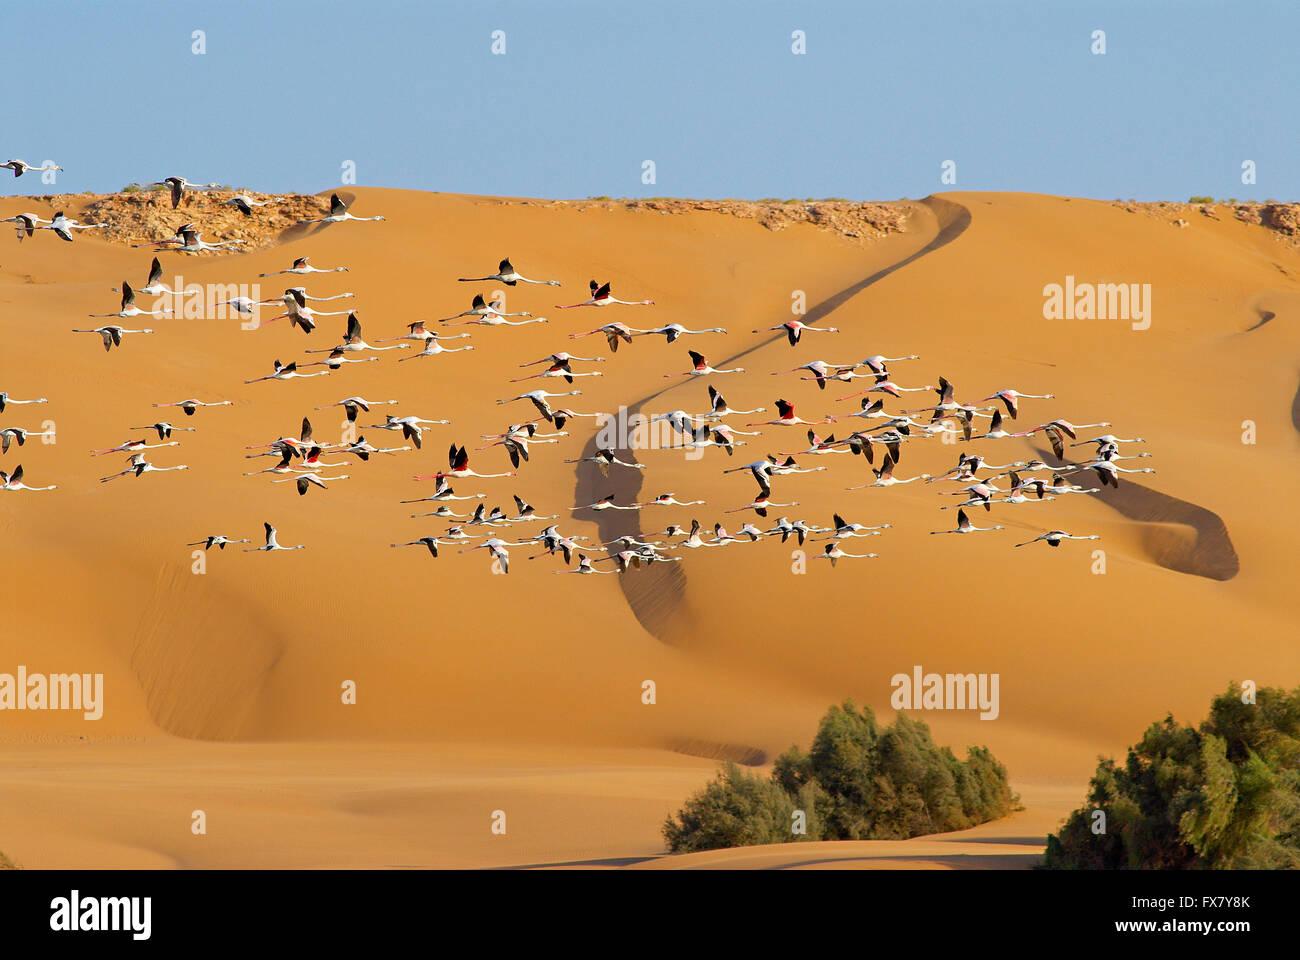 Morocco, Laayoune, Desert, laguna, Former Spanish Sahara - Stock Image